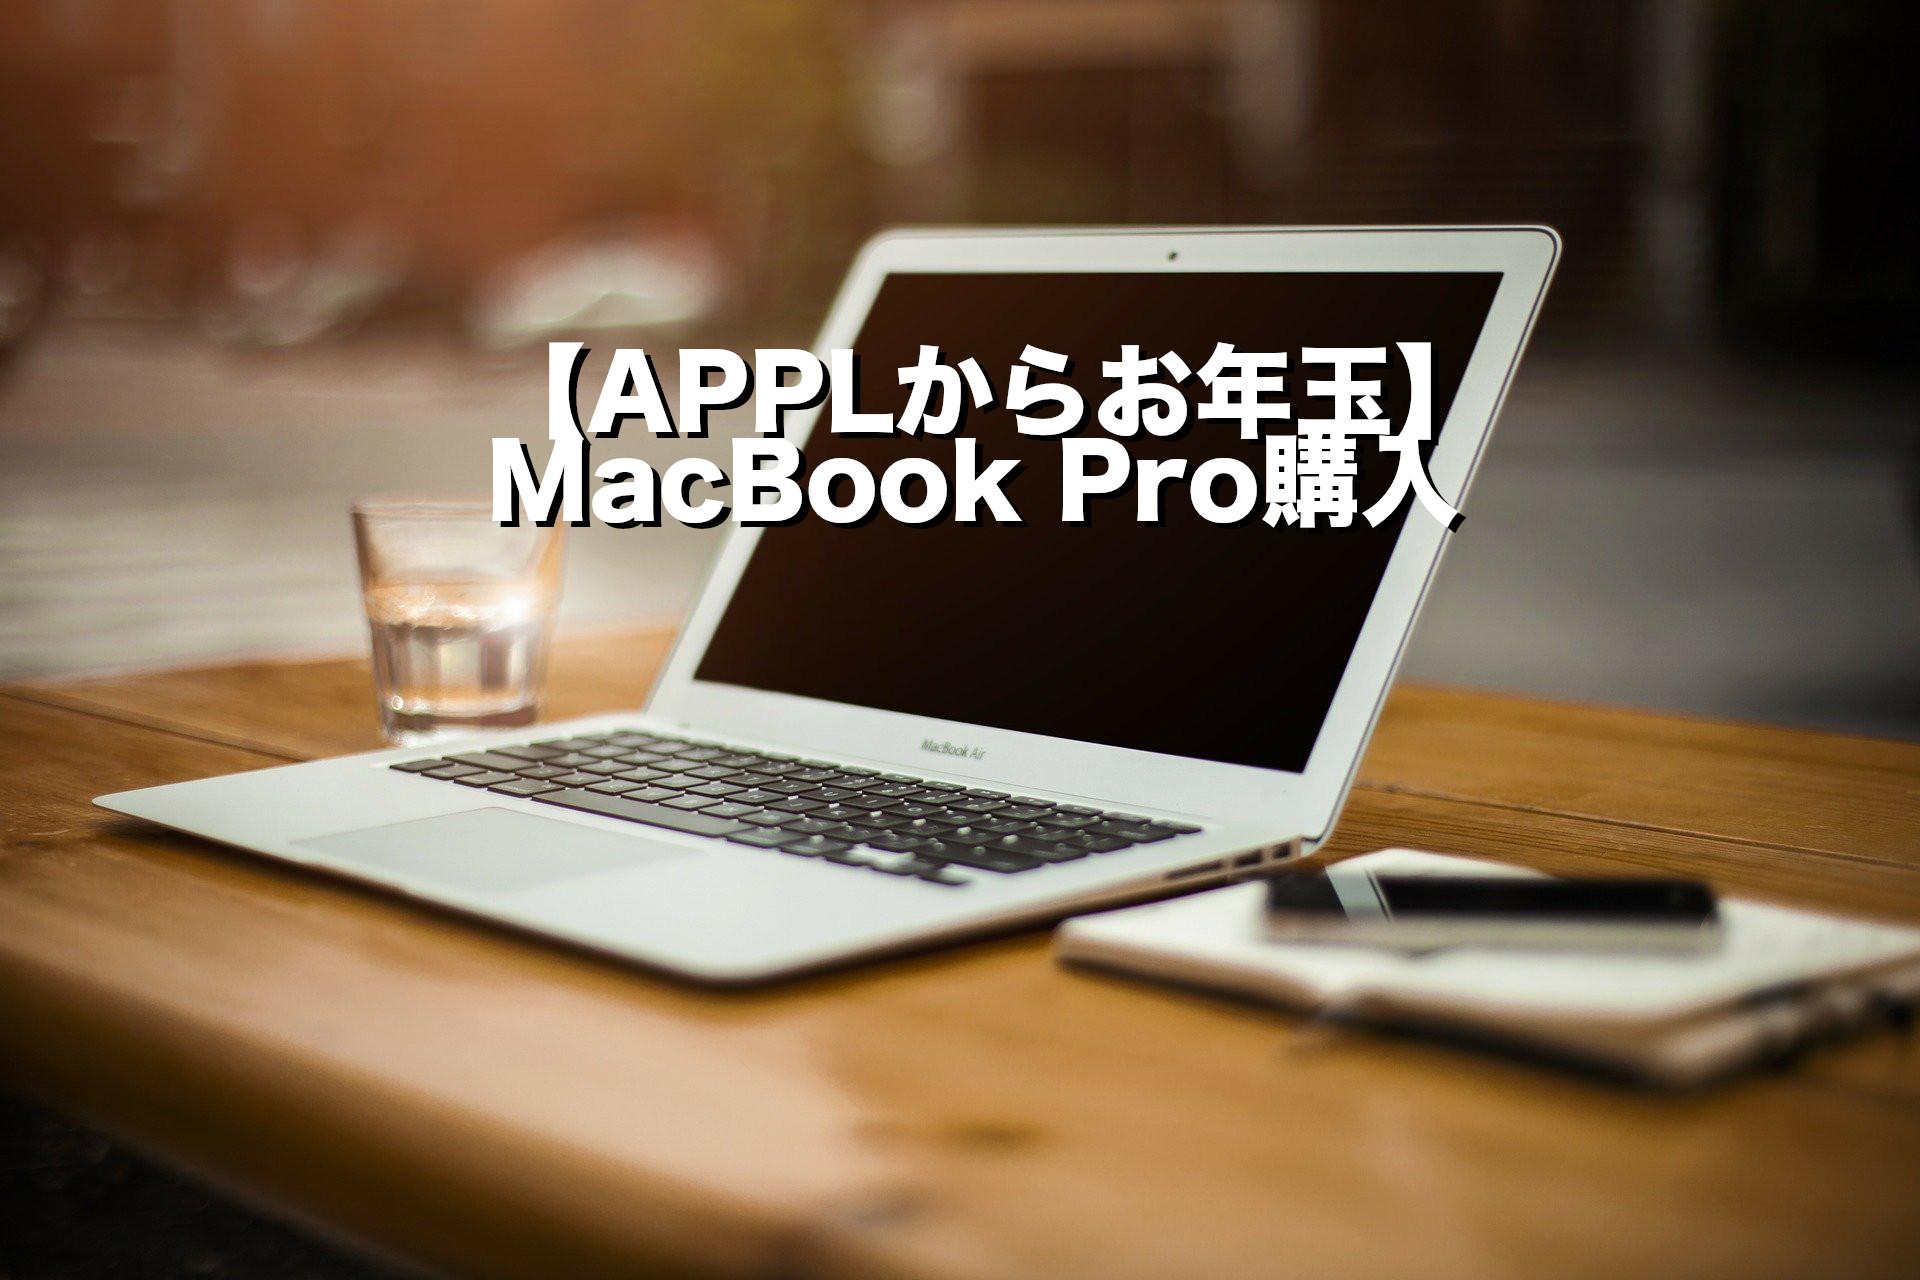 【APPLからお年玉】MacBook Pro購入!